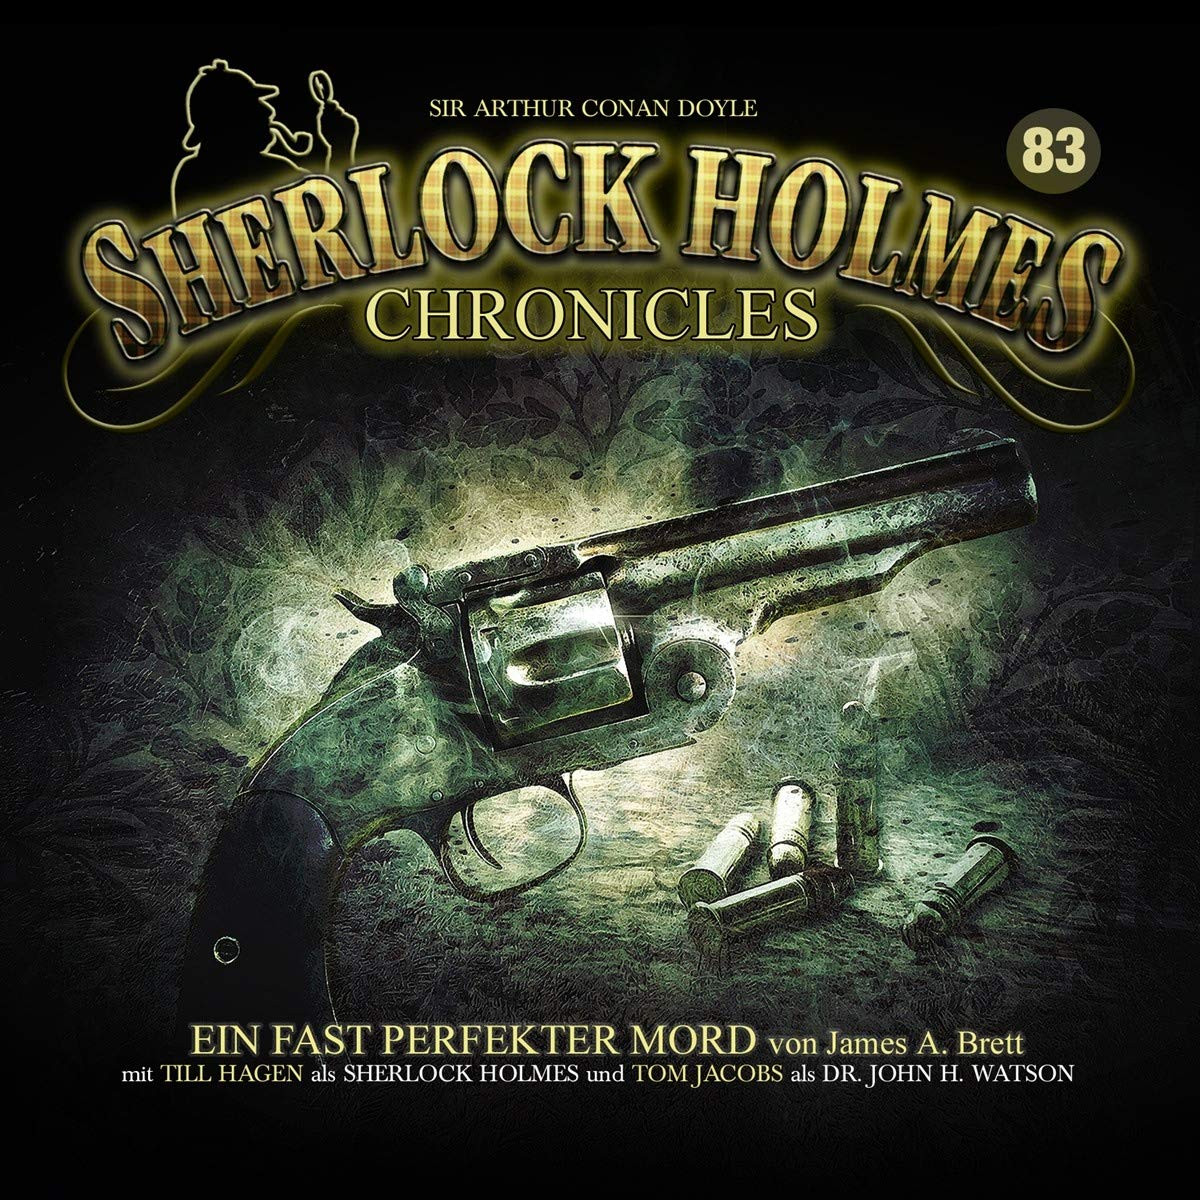 Sherlock Holmes Chronicles 83 Ein fast perfekter Mord